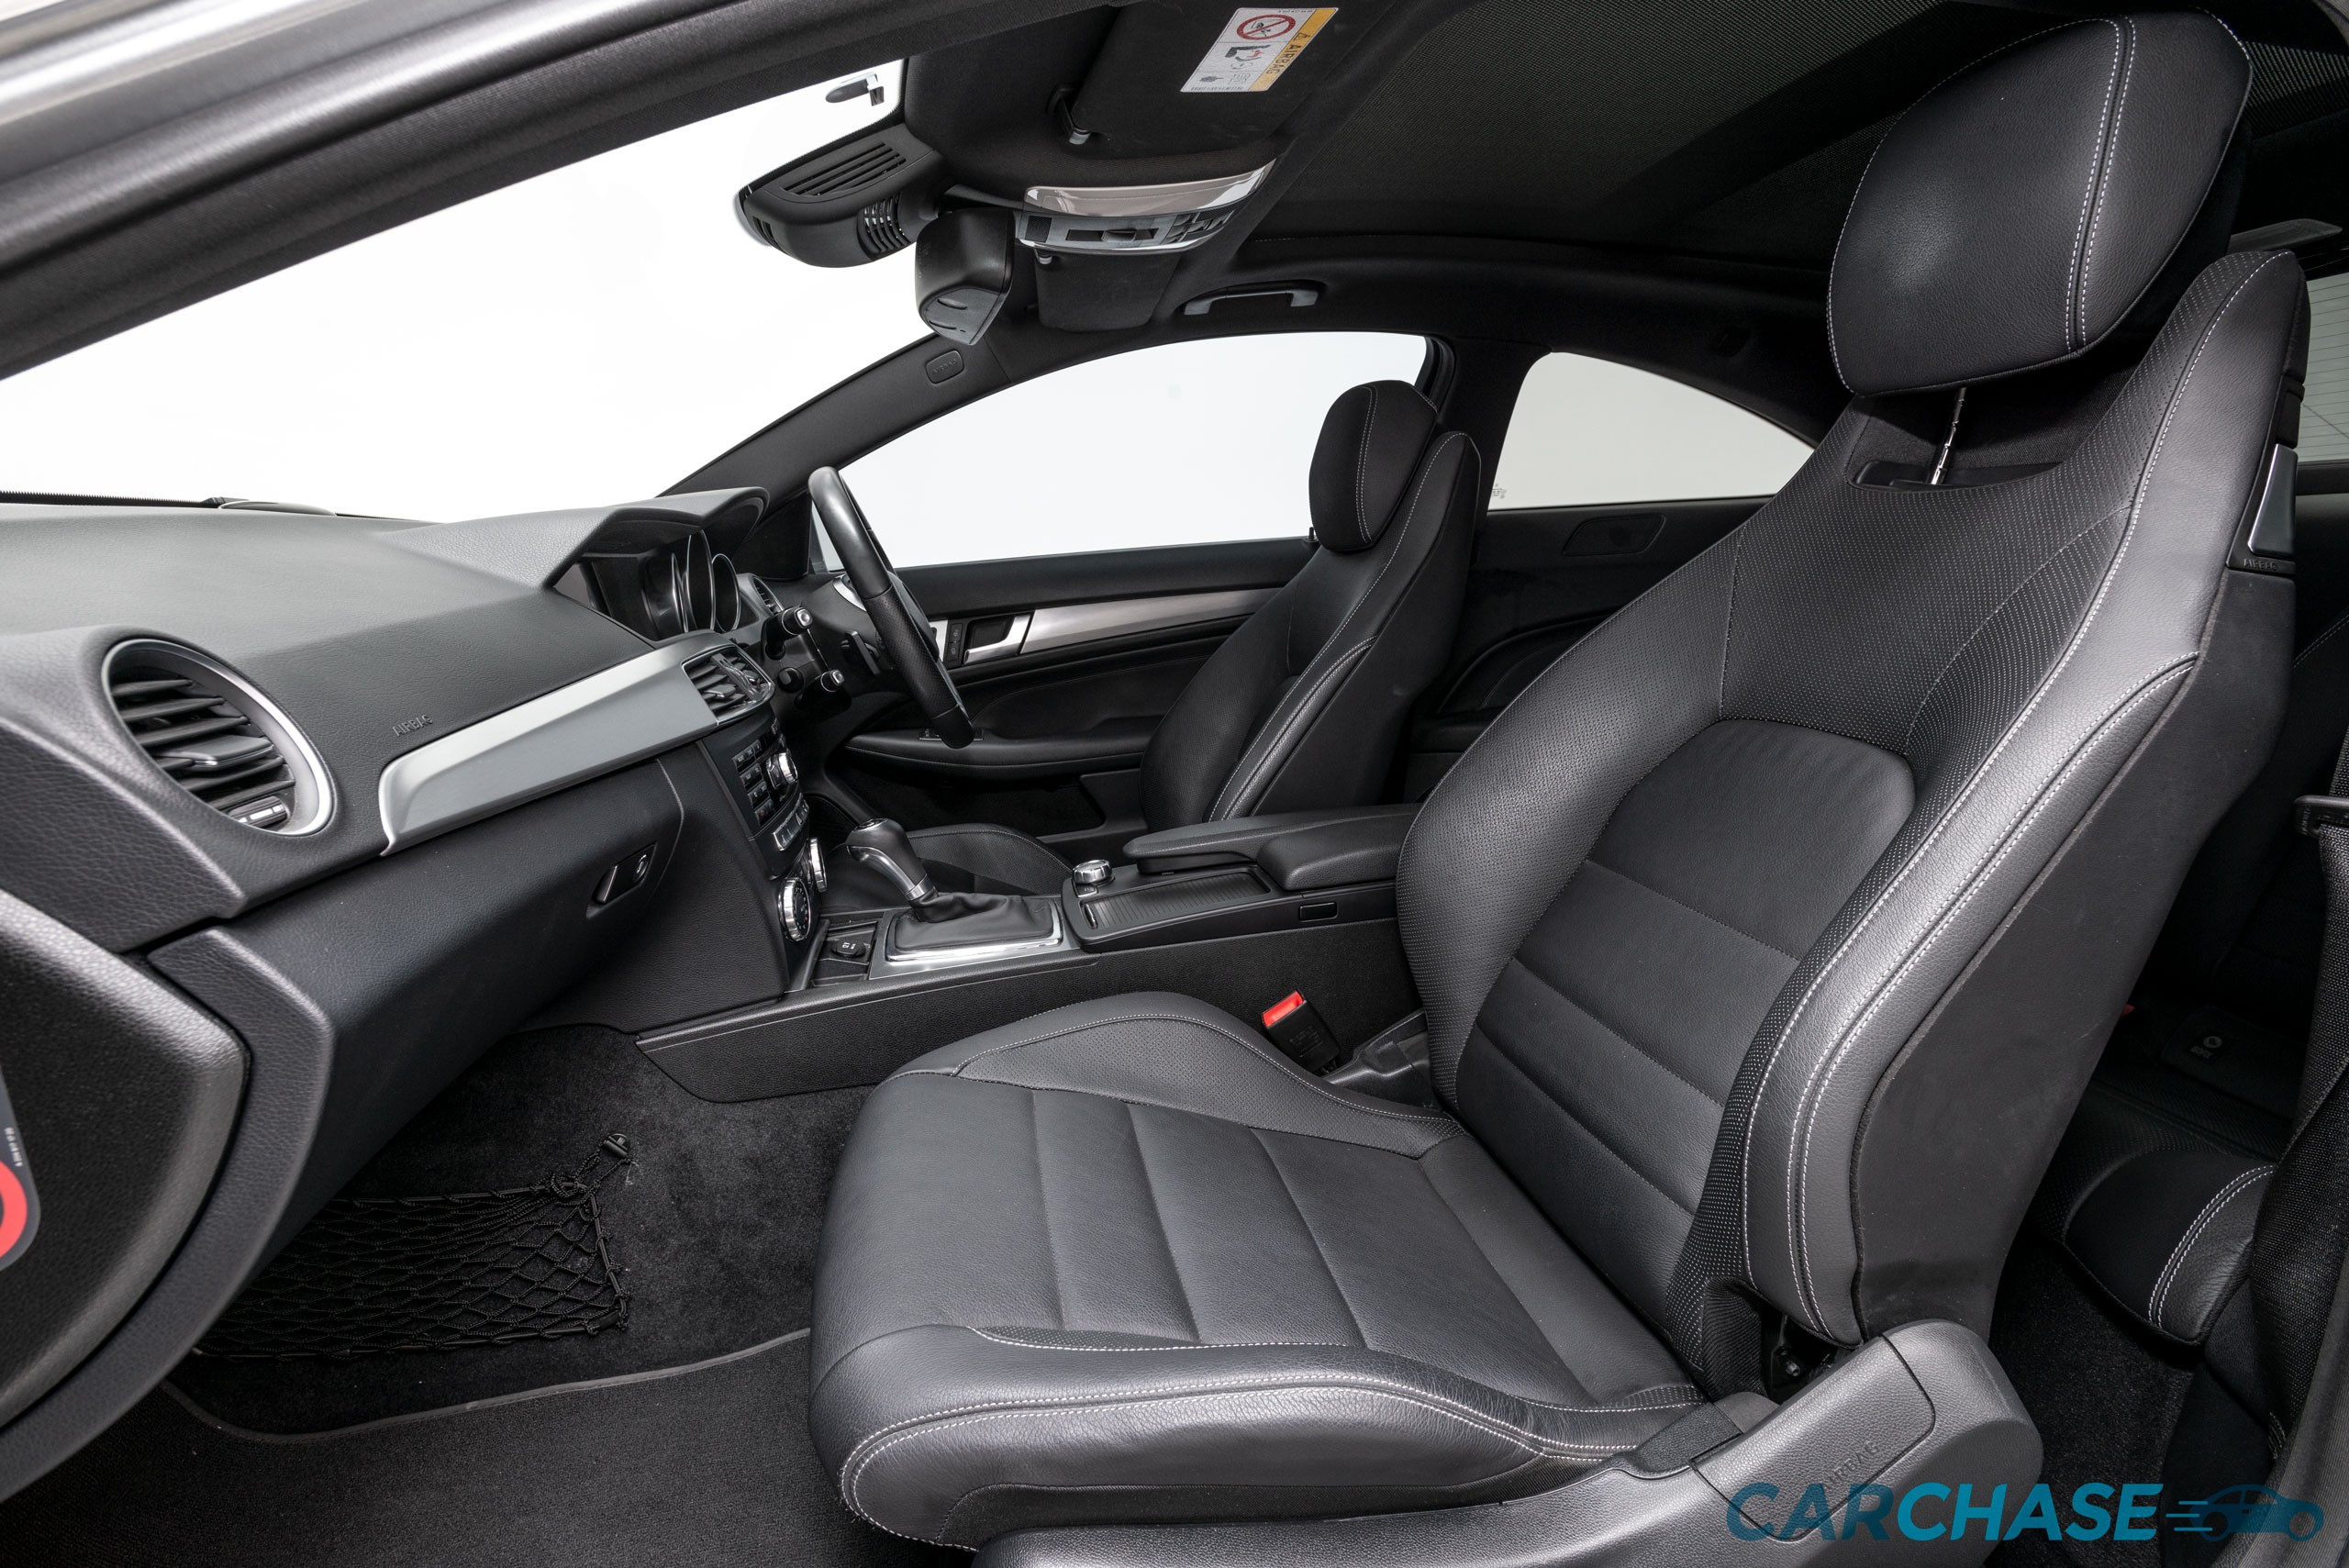 Image of passenger front profile of 2015 Mercedes-Benz C250 CDi Avantgarde